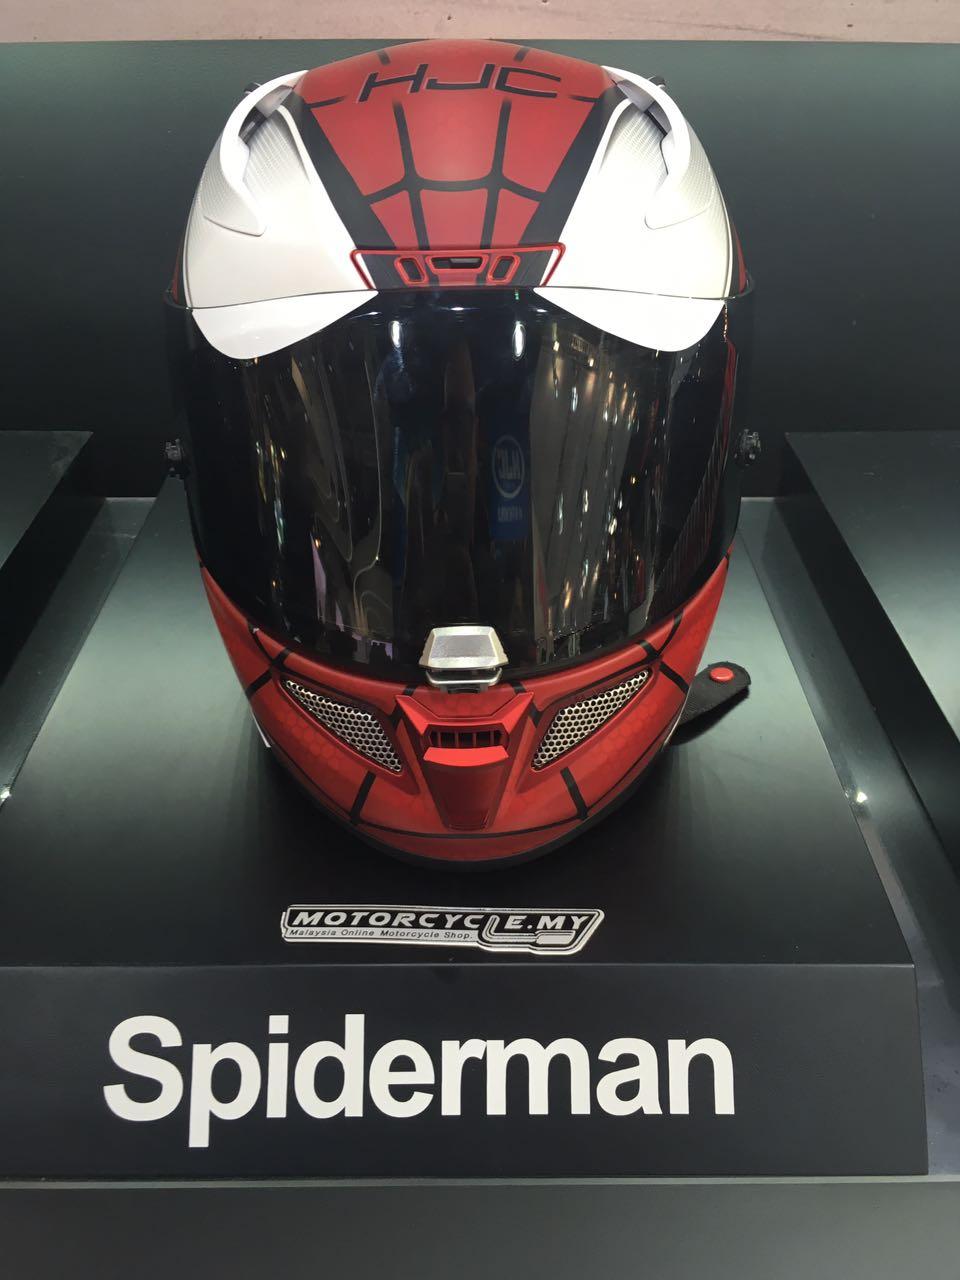 Marvel Limited Edition HJC Helmets @ EICMA - Spiderman, Ironman, Avengers, Punisher, Venom Helmets